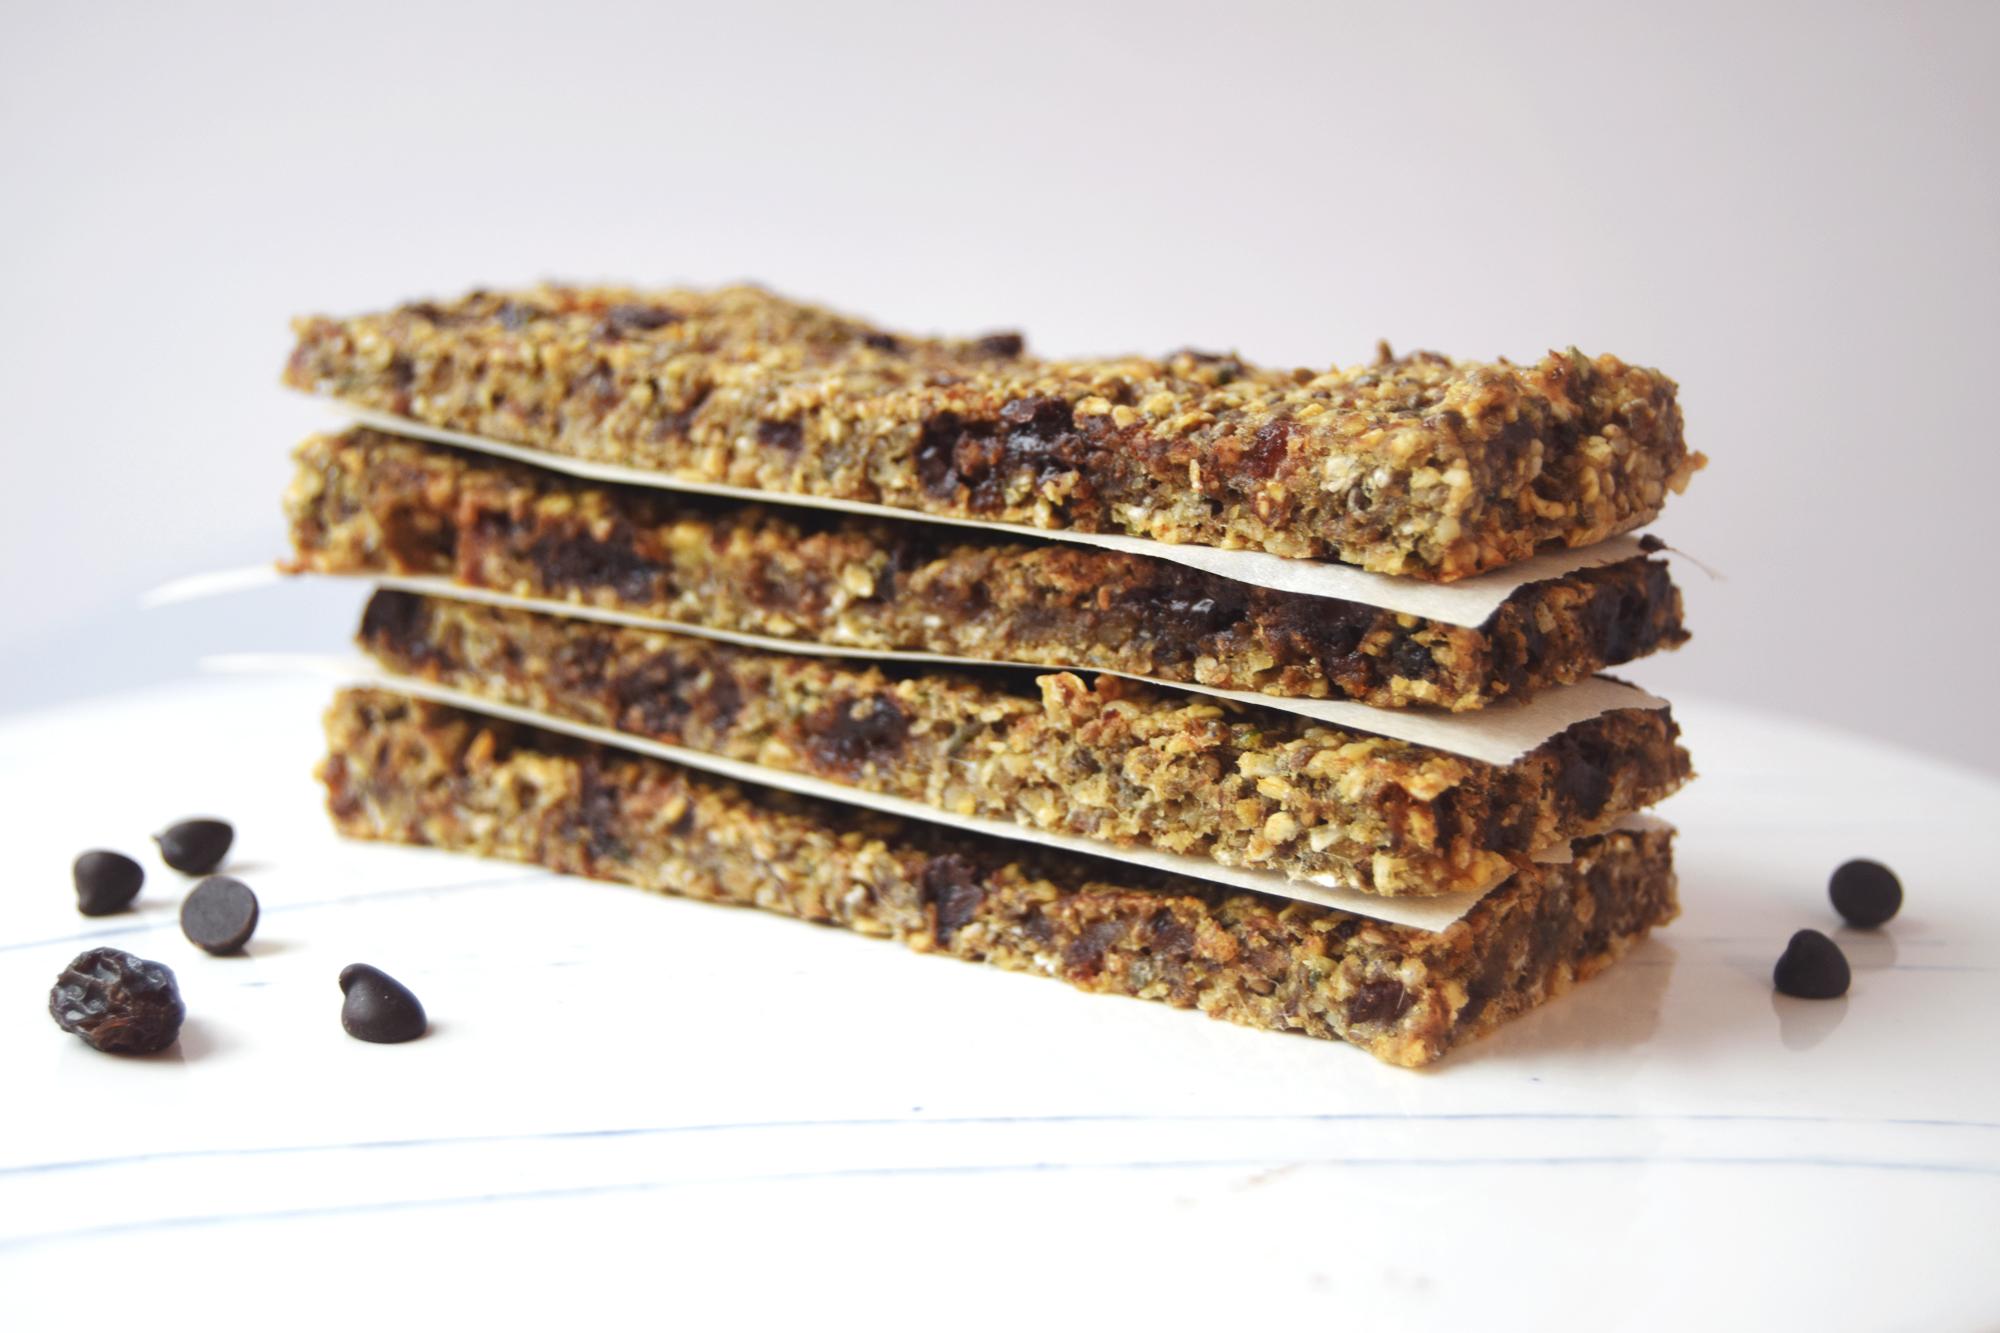 Healthy Nut Free Granola Bar Recipe - That Mama Glow